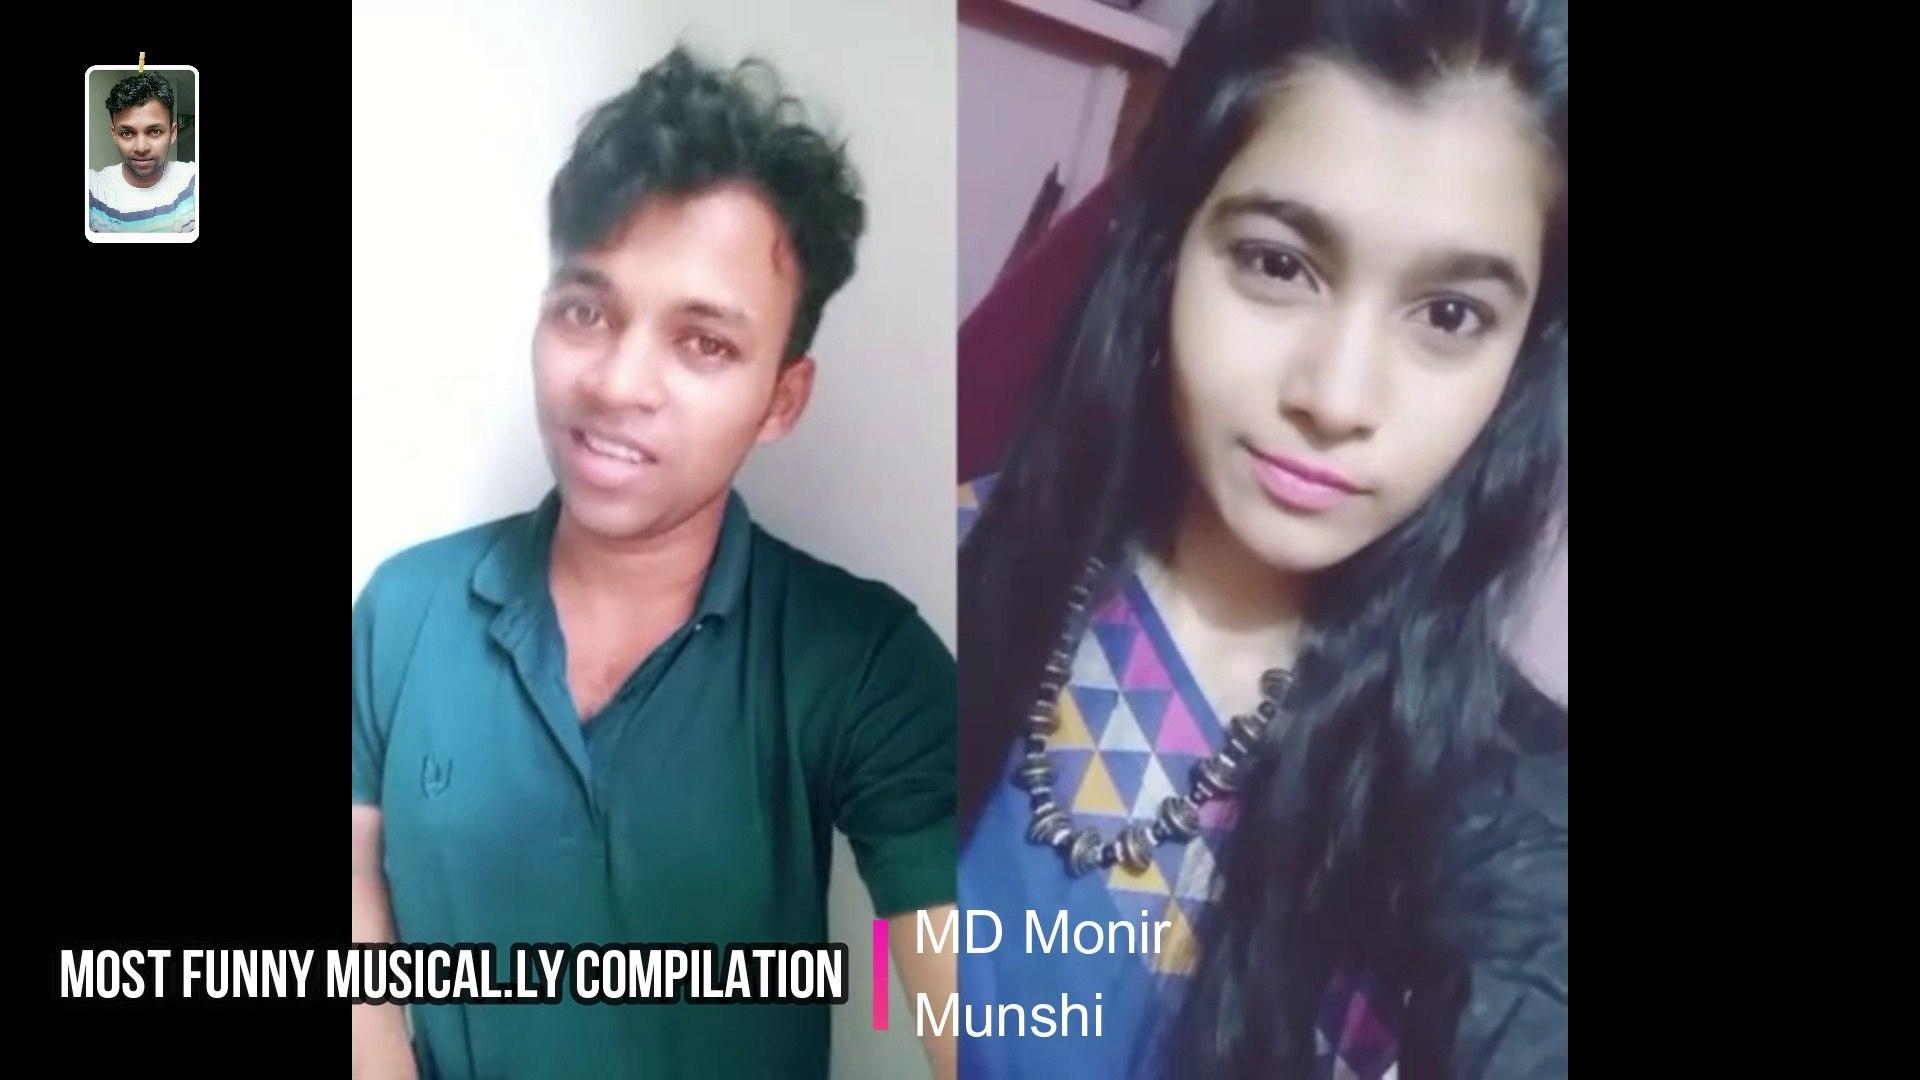 Most Funny Musical.ly Compilation MD Monir Munshi 04 Jul 2018